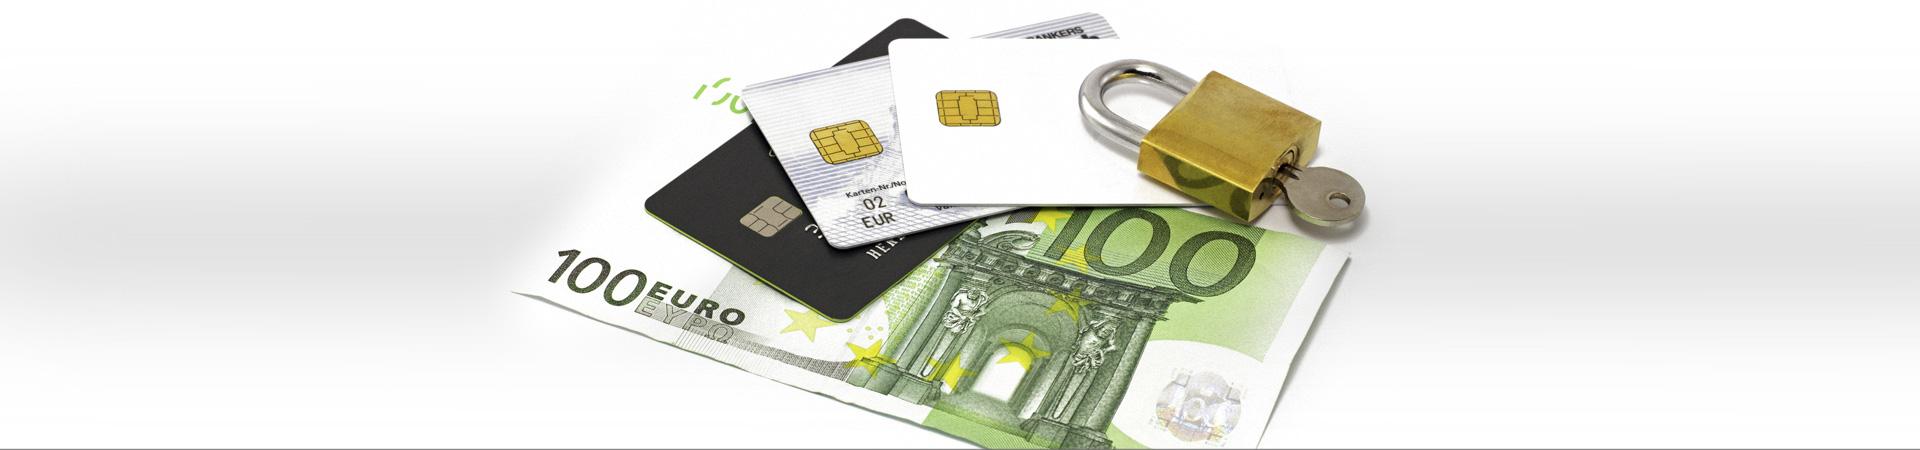 Kreditkartenverlust